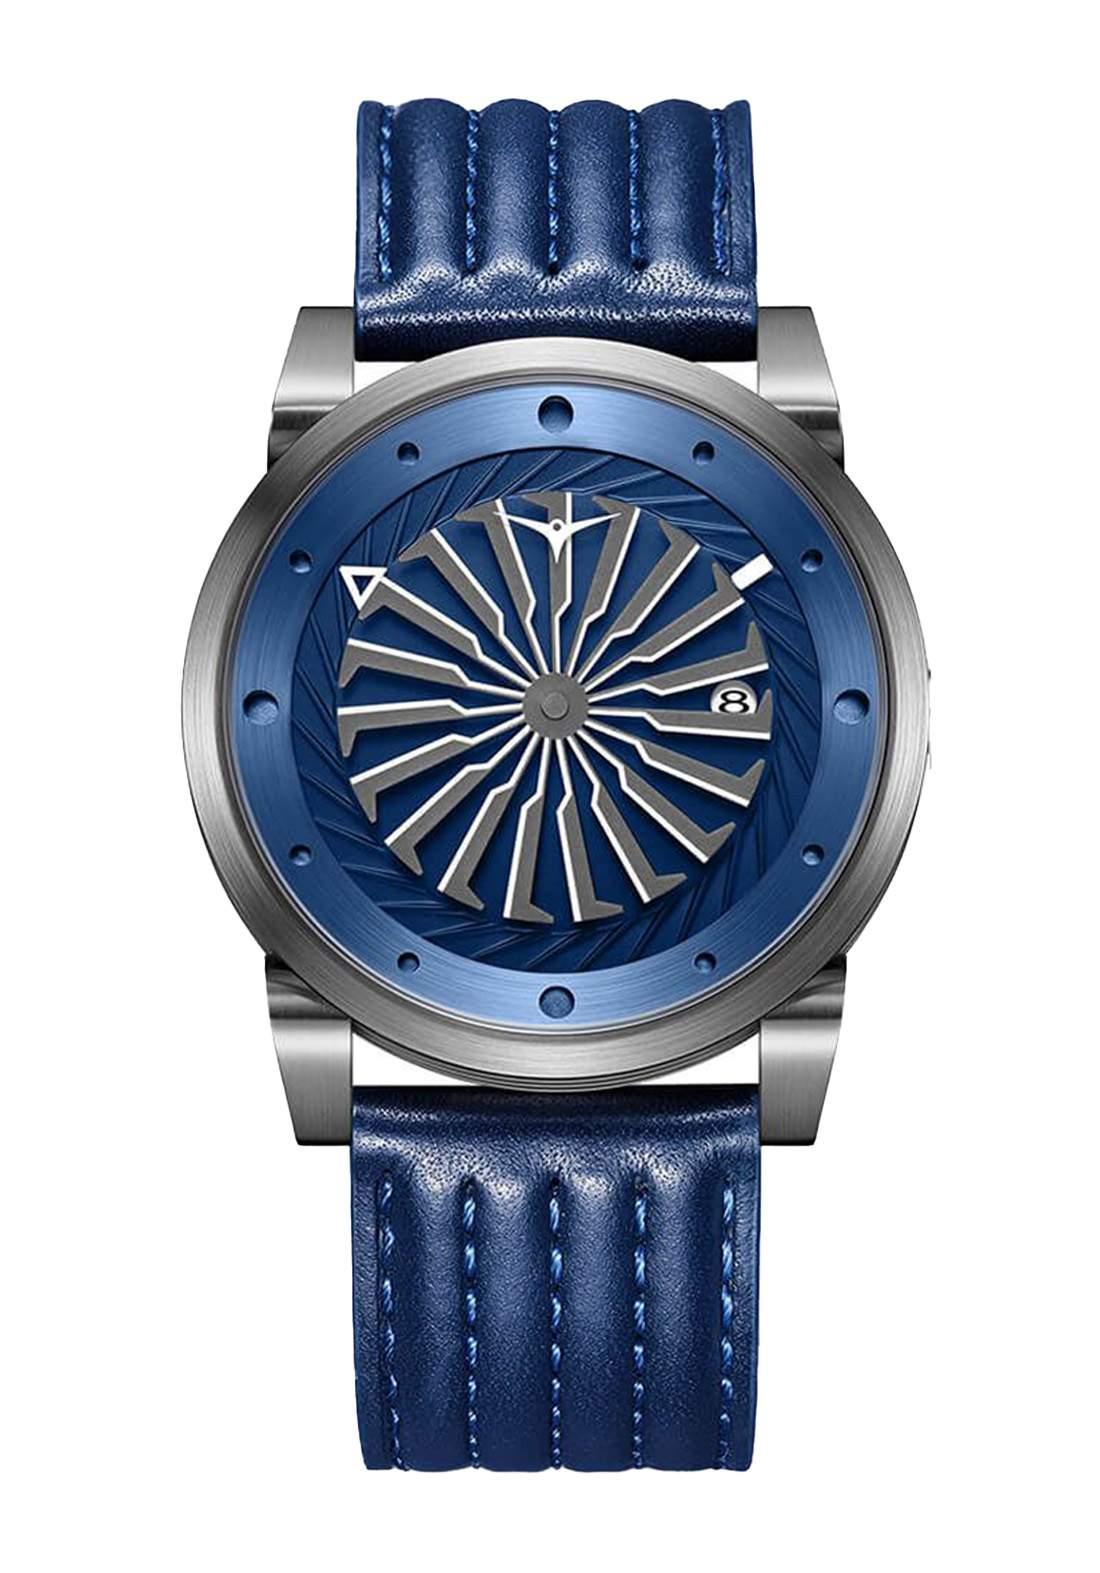 Zinvo Rival  Alpha Watch For Men - Blue  ساعة رجالي